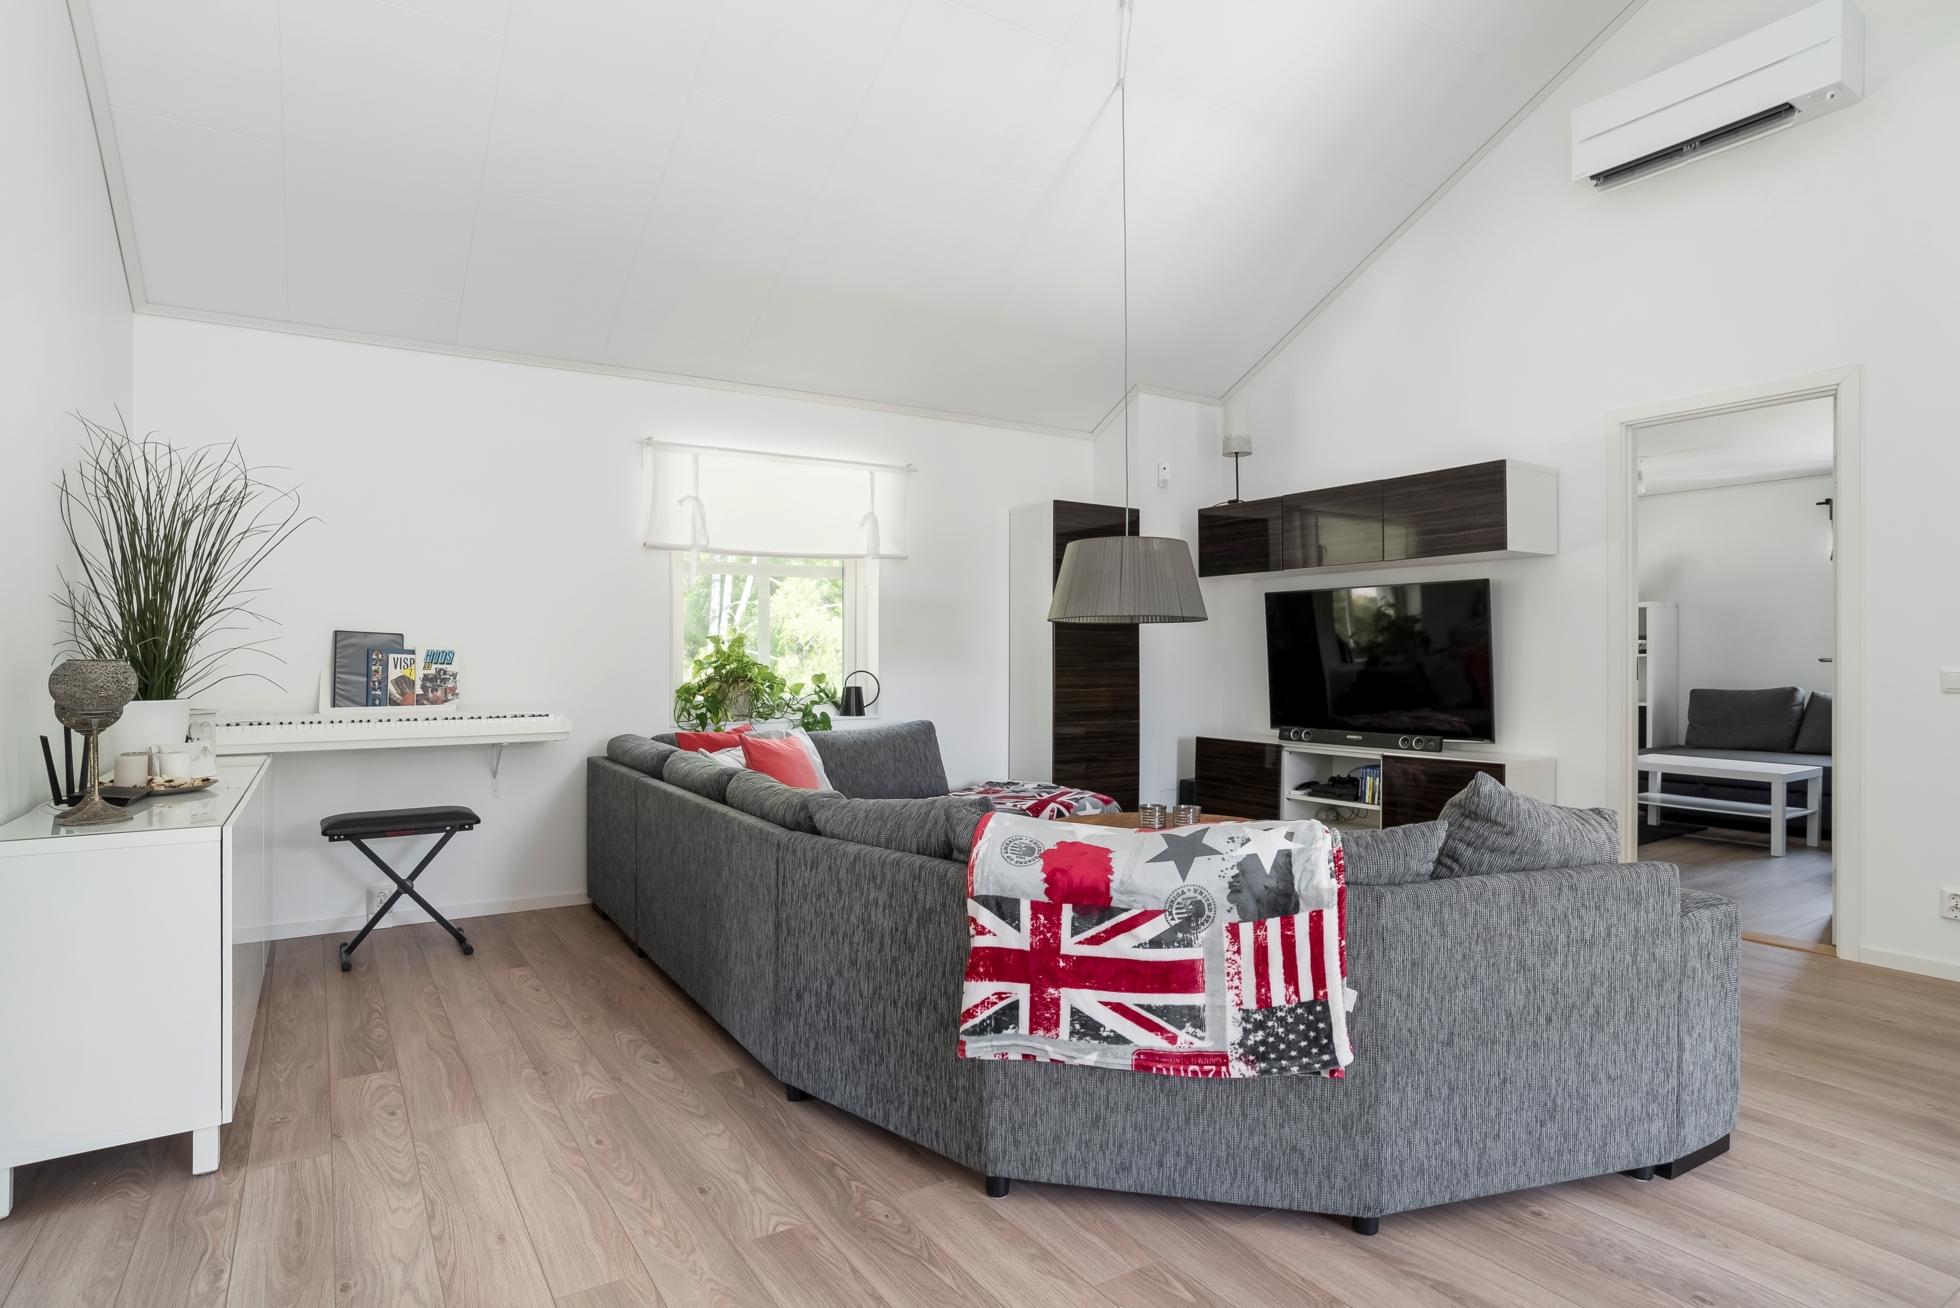 Havsnära familjevilla i nyskick – 5 sovrum, 6m i takhöjd